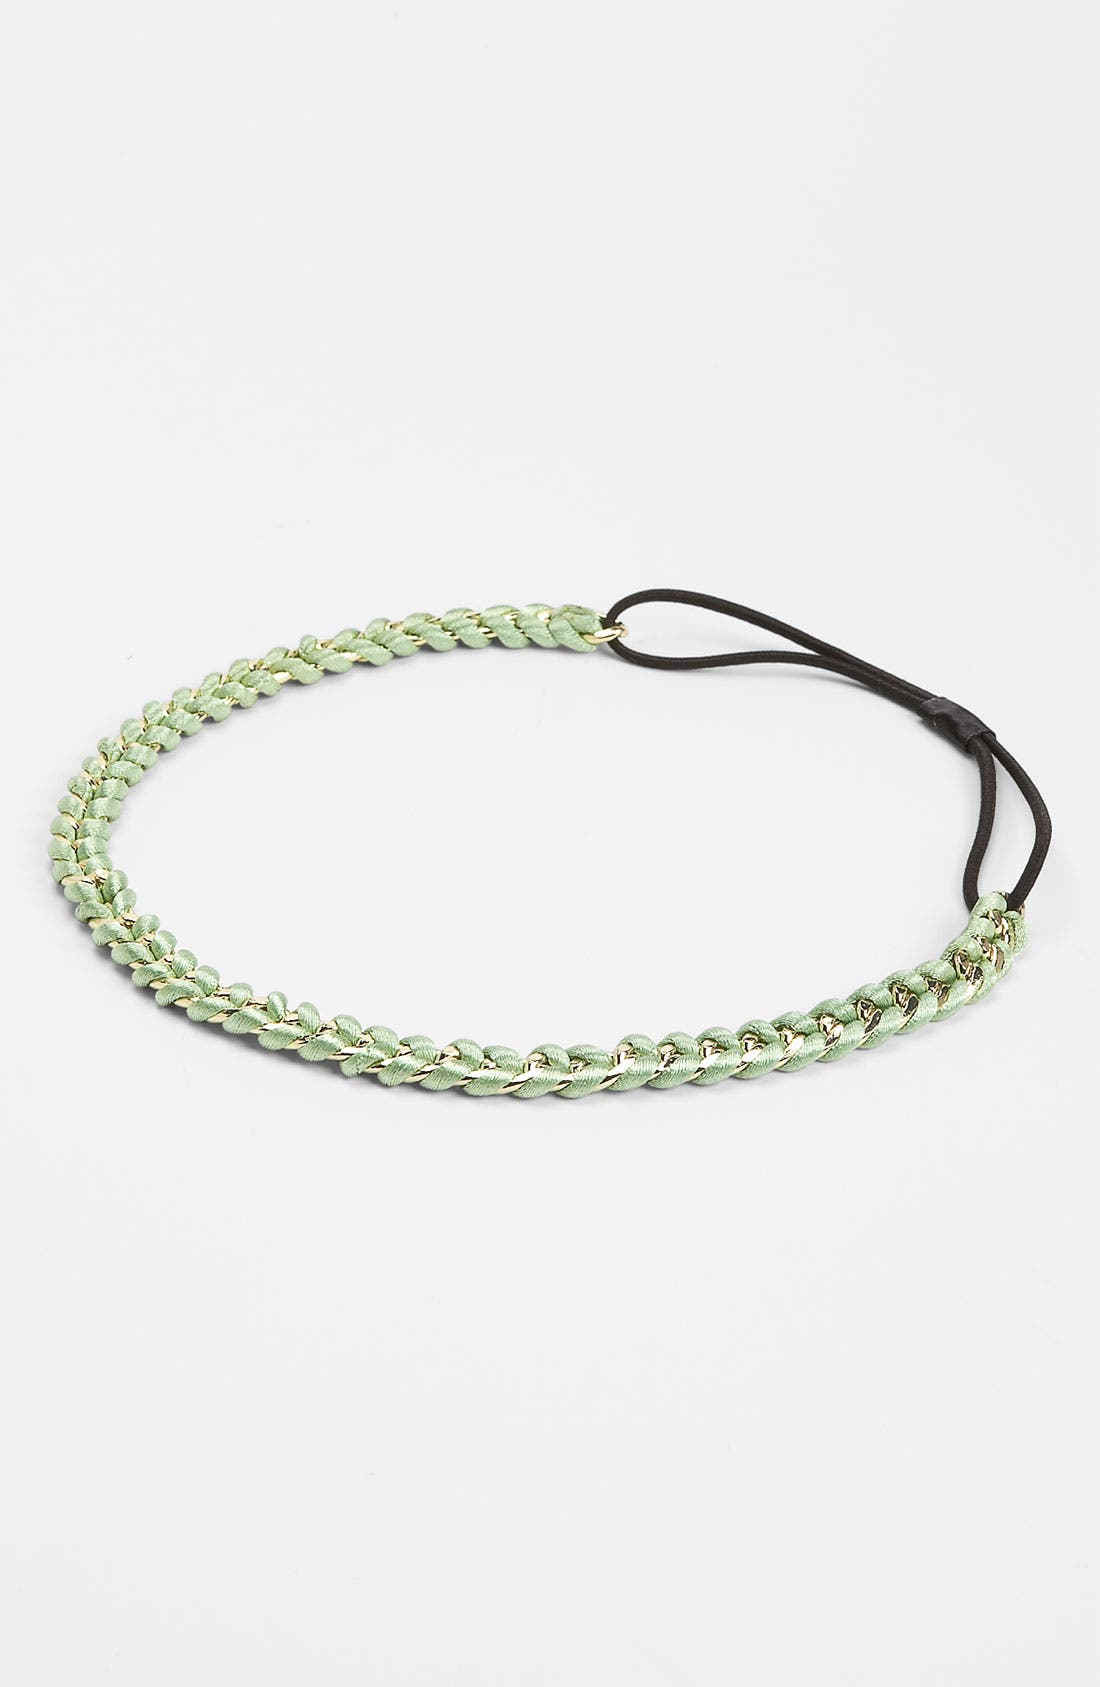 Alternate Image 1 Selected - Lulu Braided Chain Headband